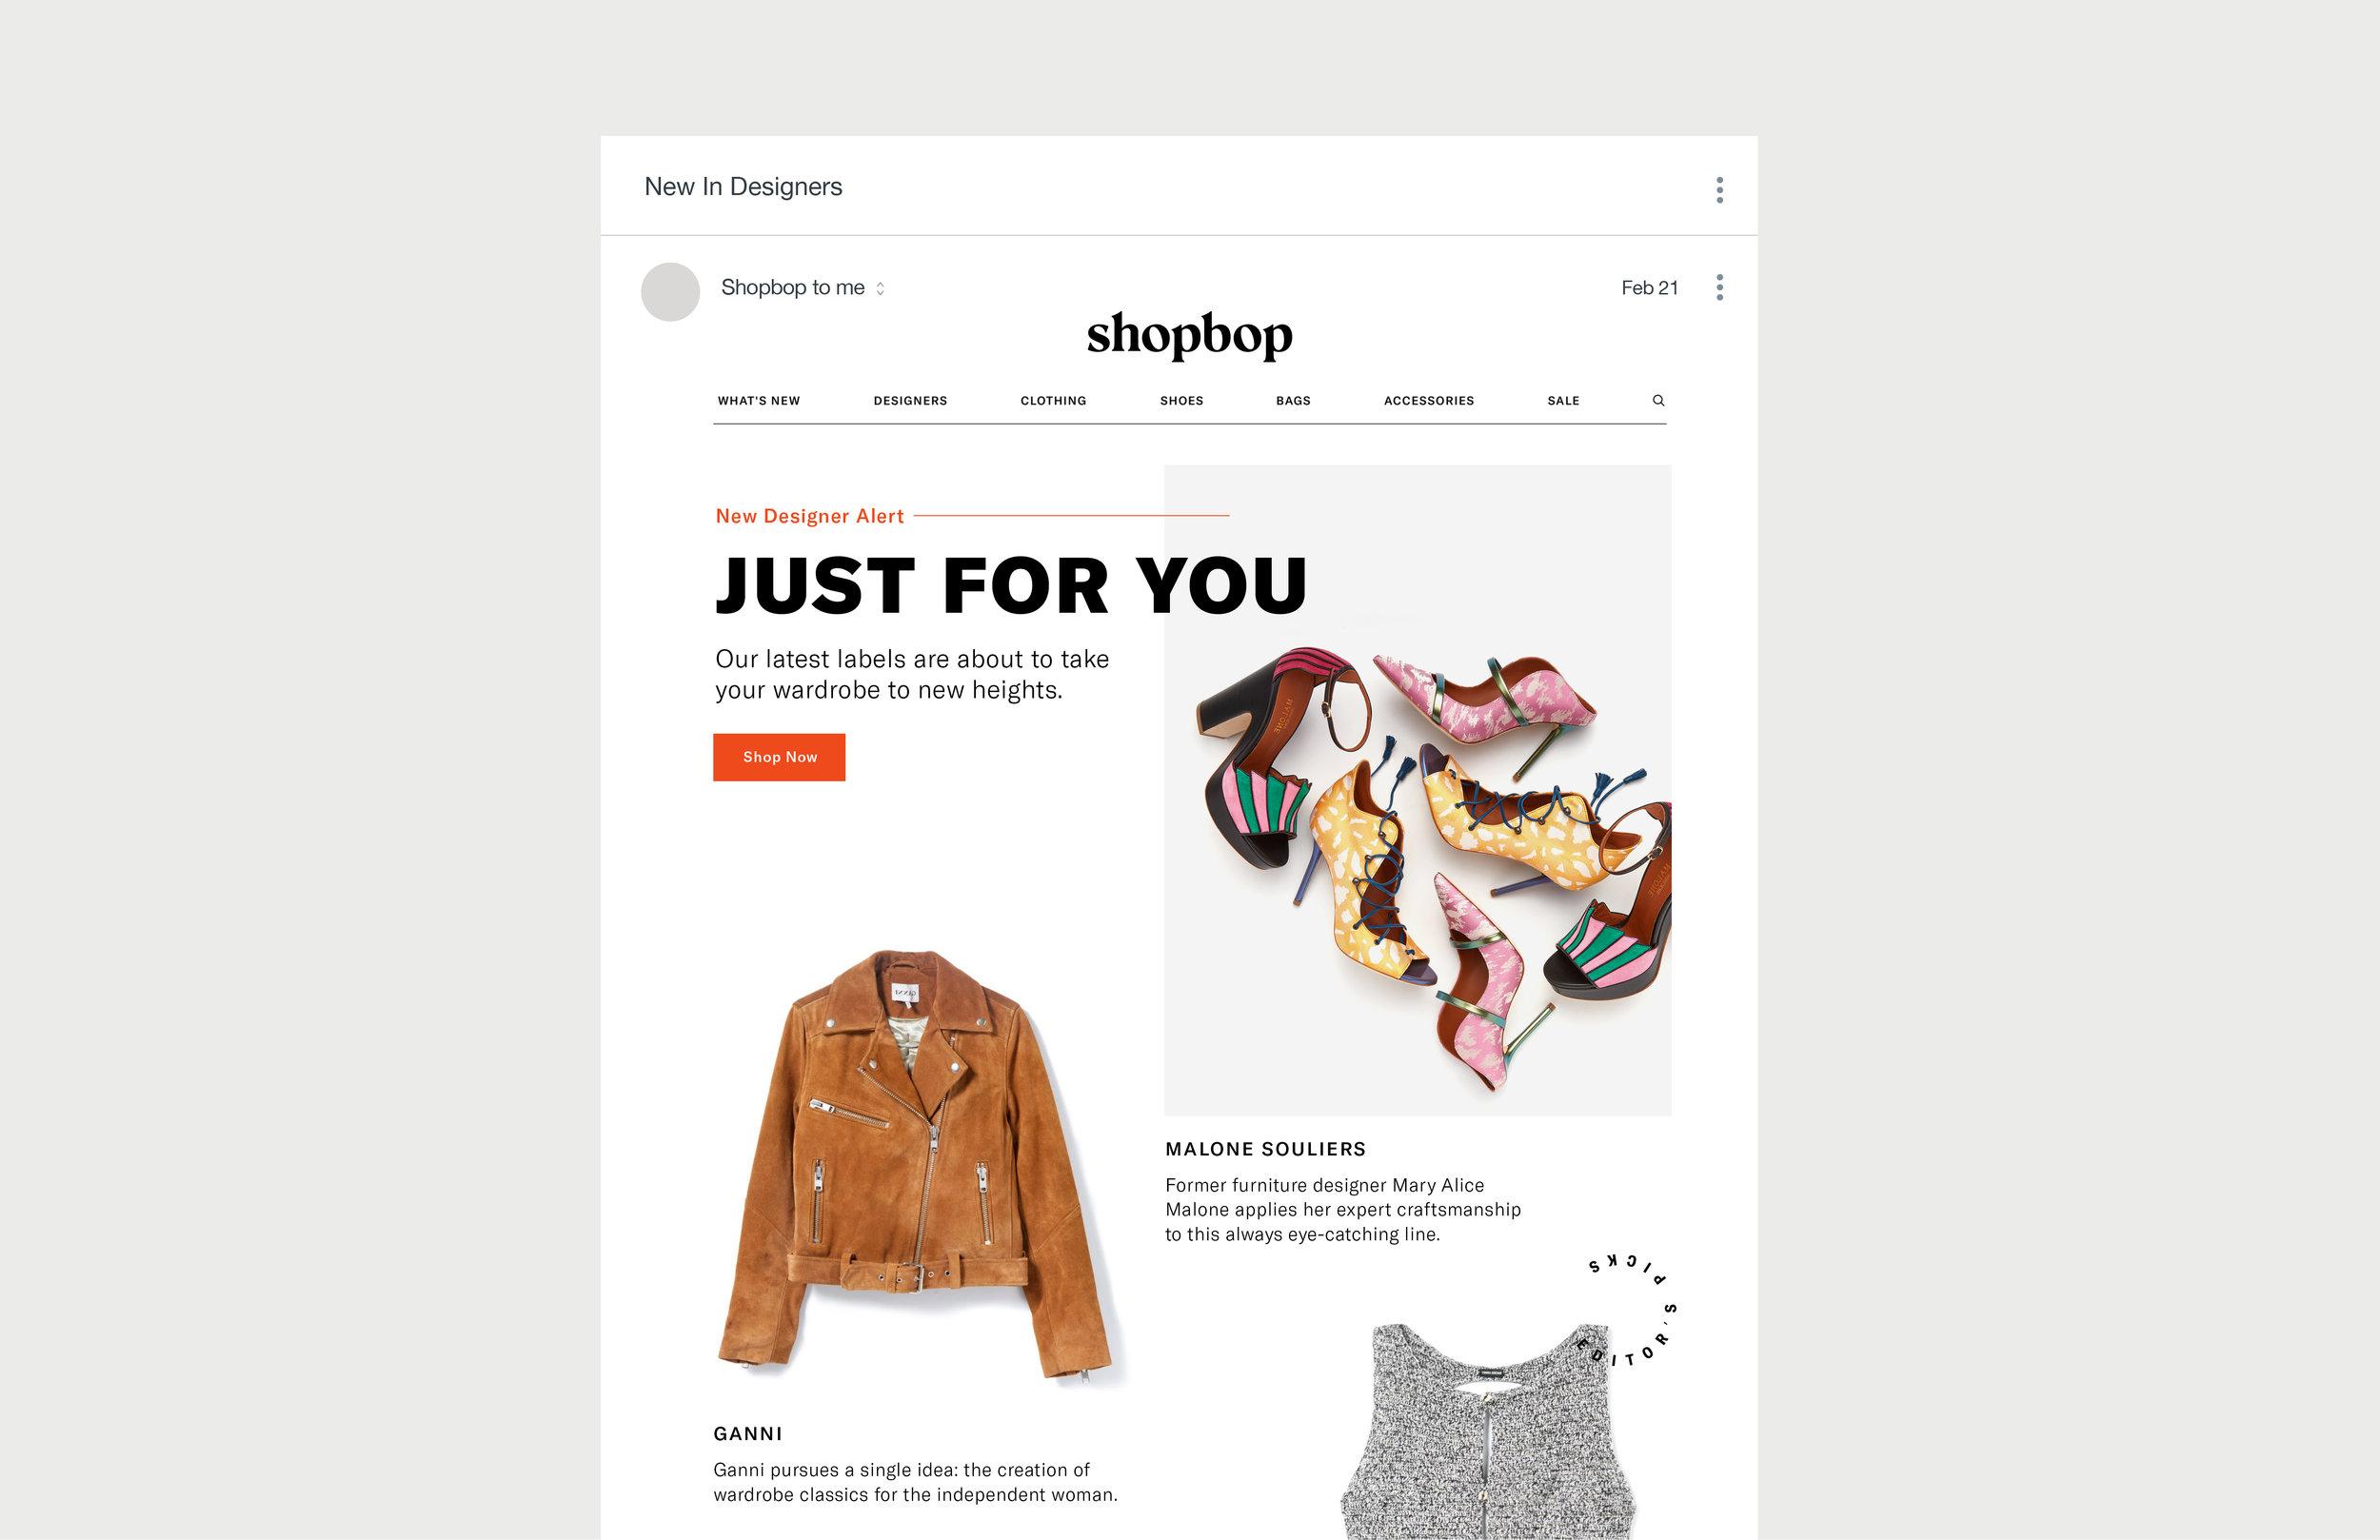 Shopbop_04.jpg